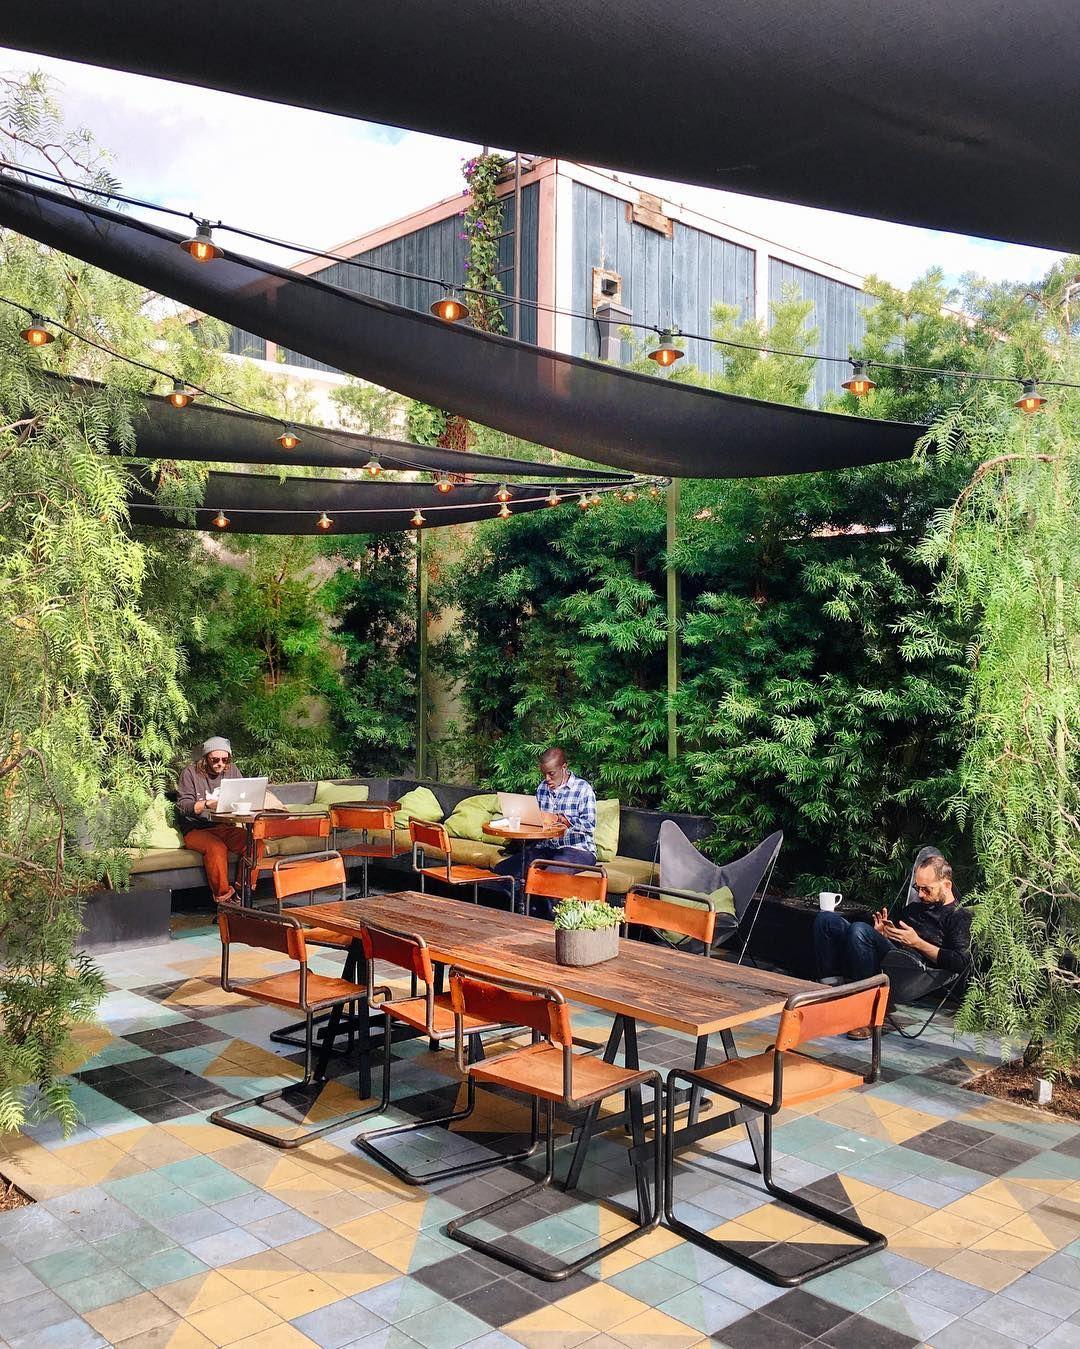 Verve Coffee West Hollywood Los Angeles California Restaurant Patio Outdoor Restaurant Patio Terrace Restaurant